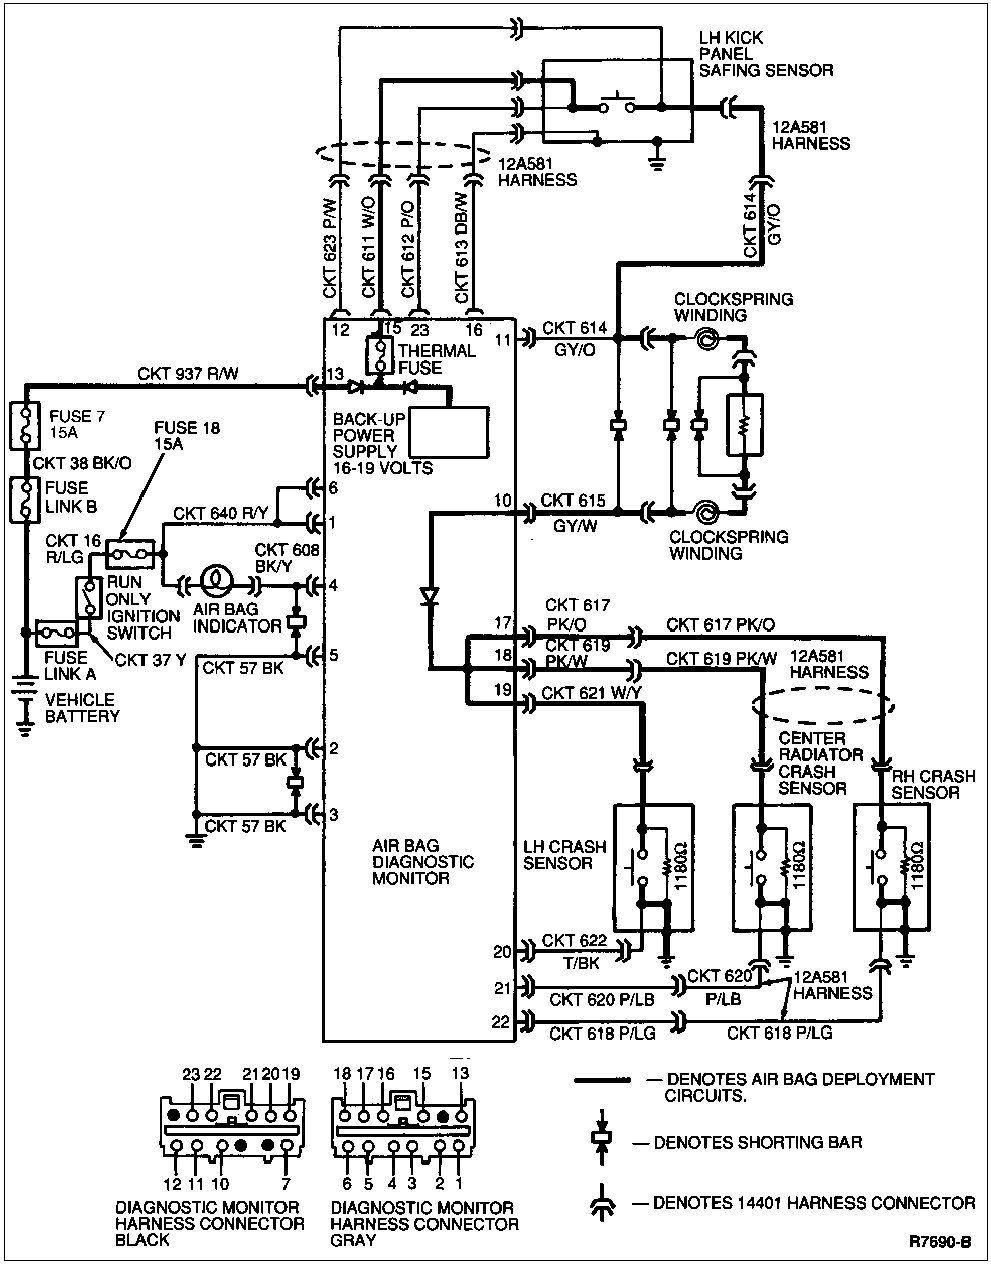 1989pontiacfirebirdwiringdiagram Http Wwwthirdgenorg Techboard